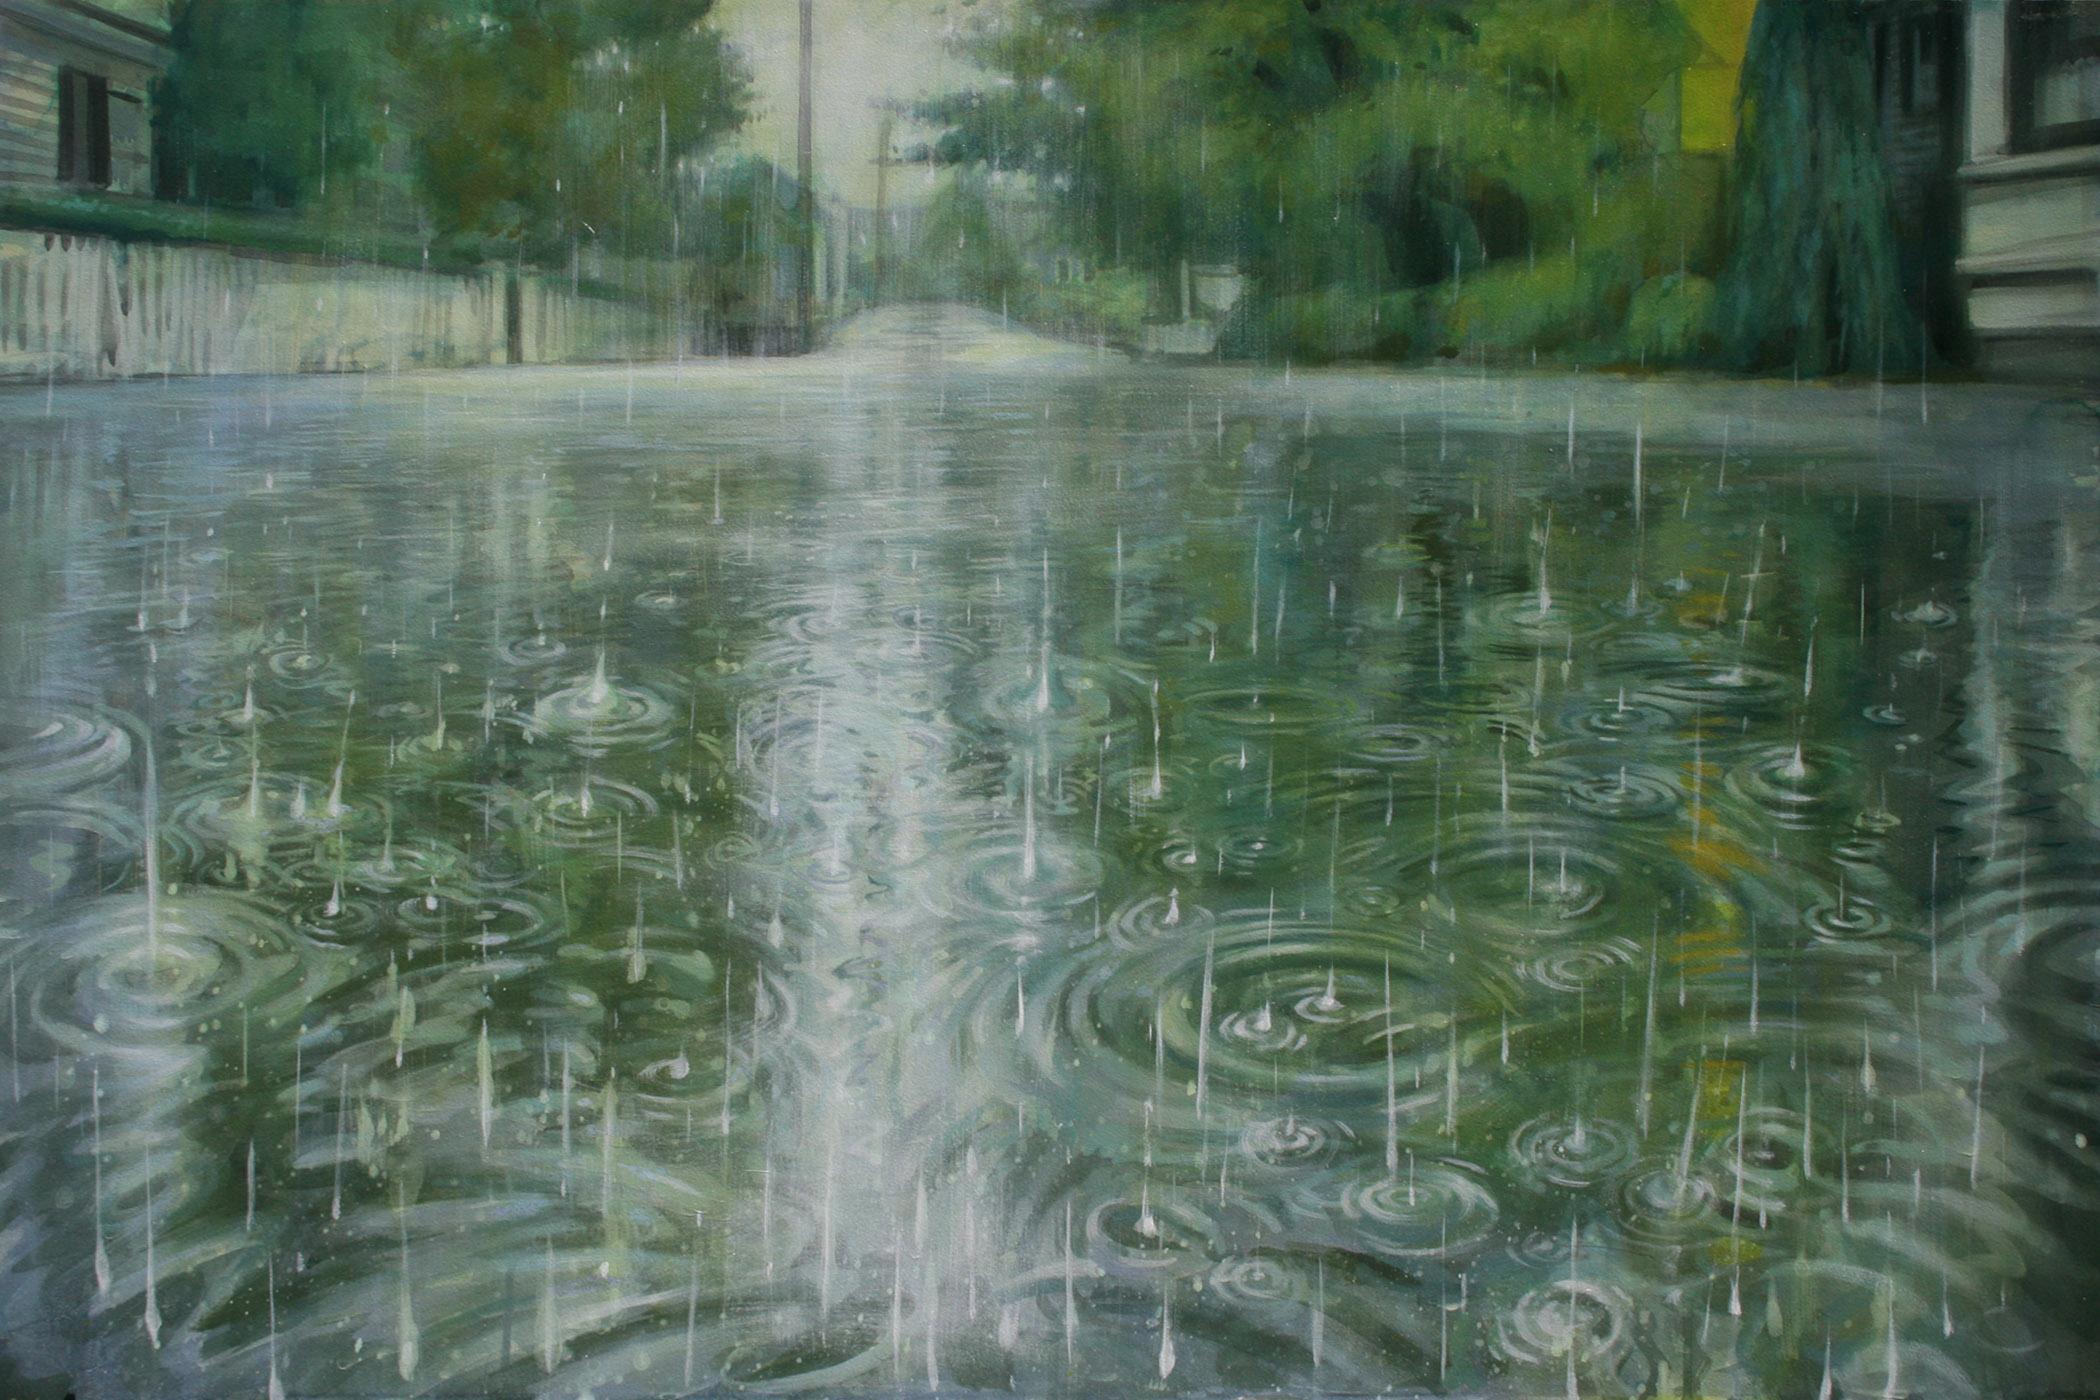 Drawn rain art With Art Graham visit provincetown